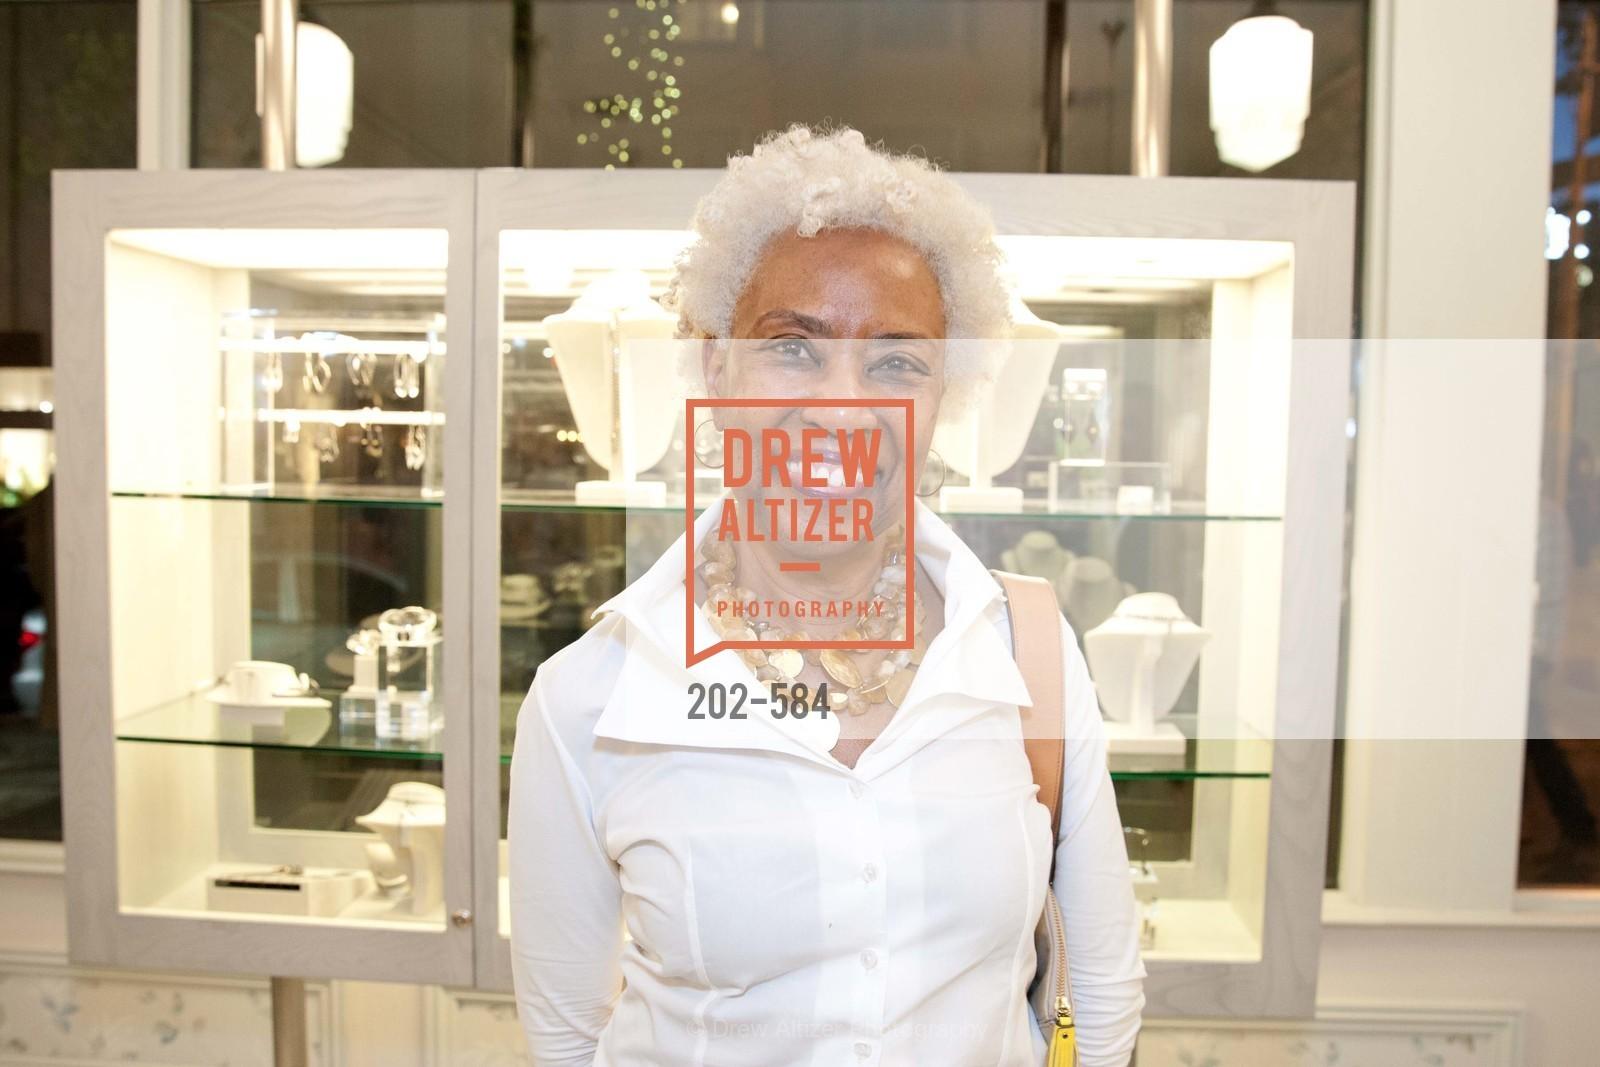 Elba McIntosh, 141001-AlexisBittar-correct, US, October 1st, 2014,Drew Altizer, Drew Altizer Photography, full-service agency, private events, San Francisco photographer, photographer california